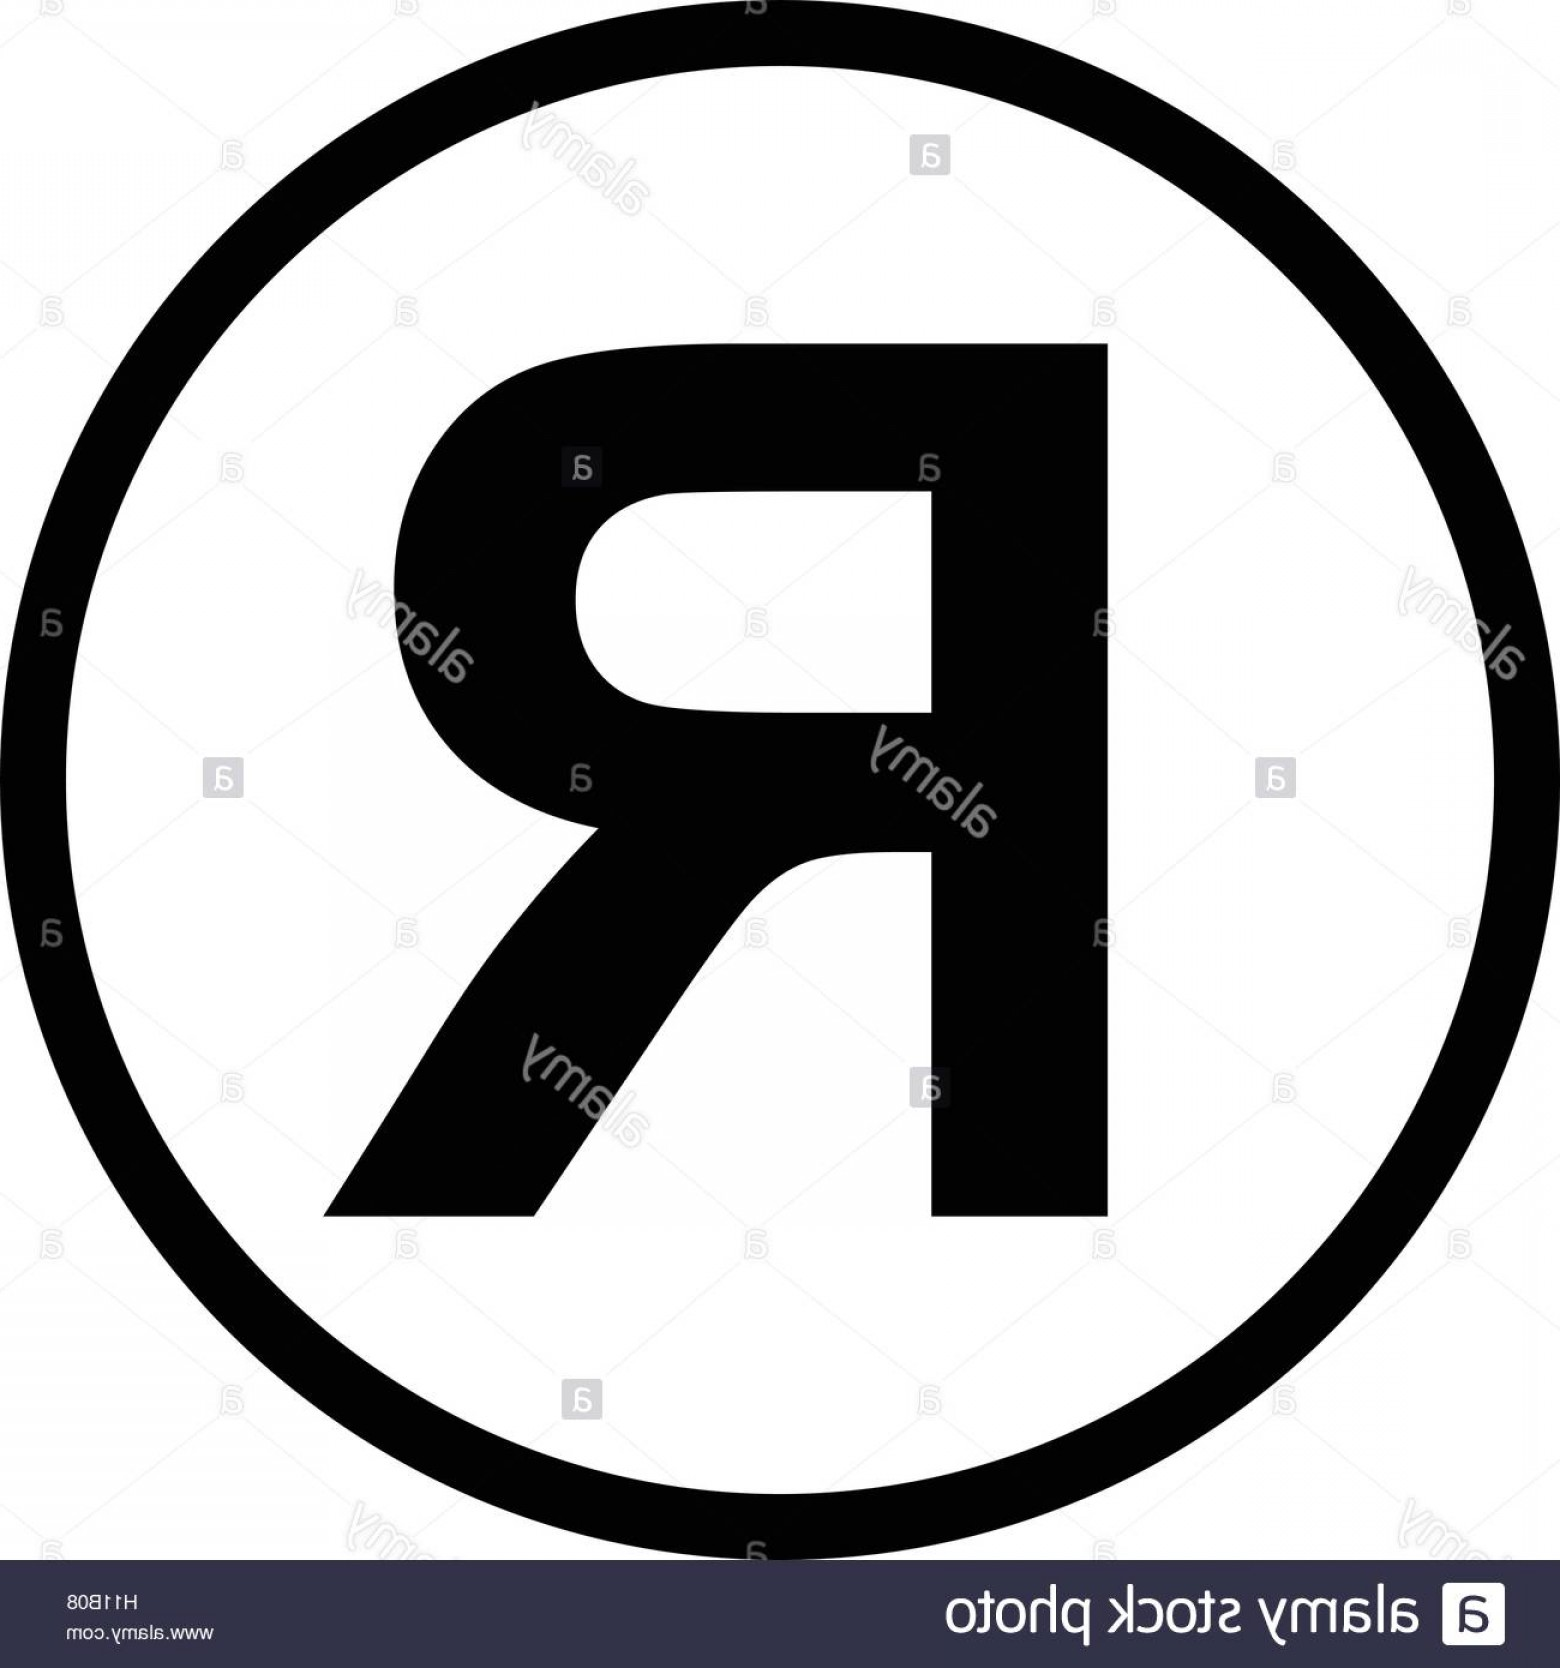 1560x1668 Stock Photo Registered Trademark Symbol Isolated Black Vector